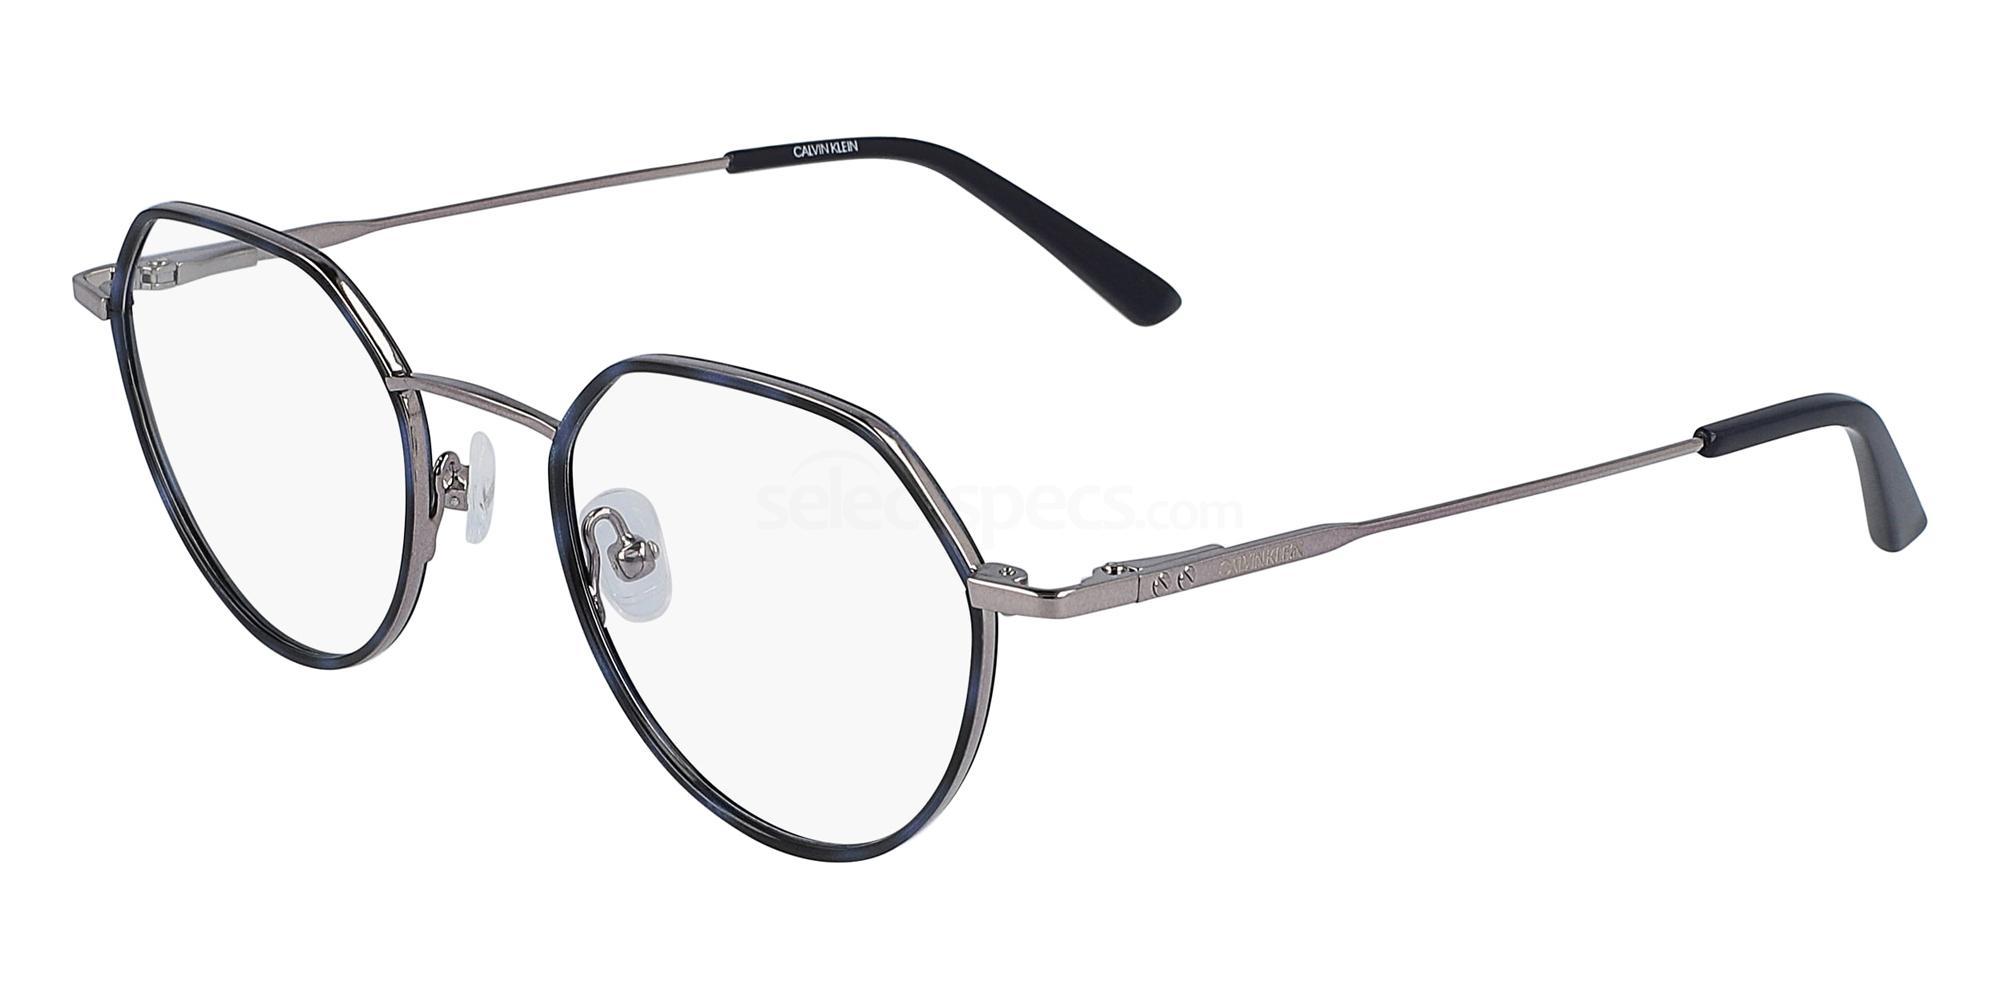 008 CK19118 Glasses, Calvin Klein